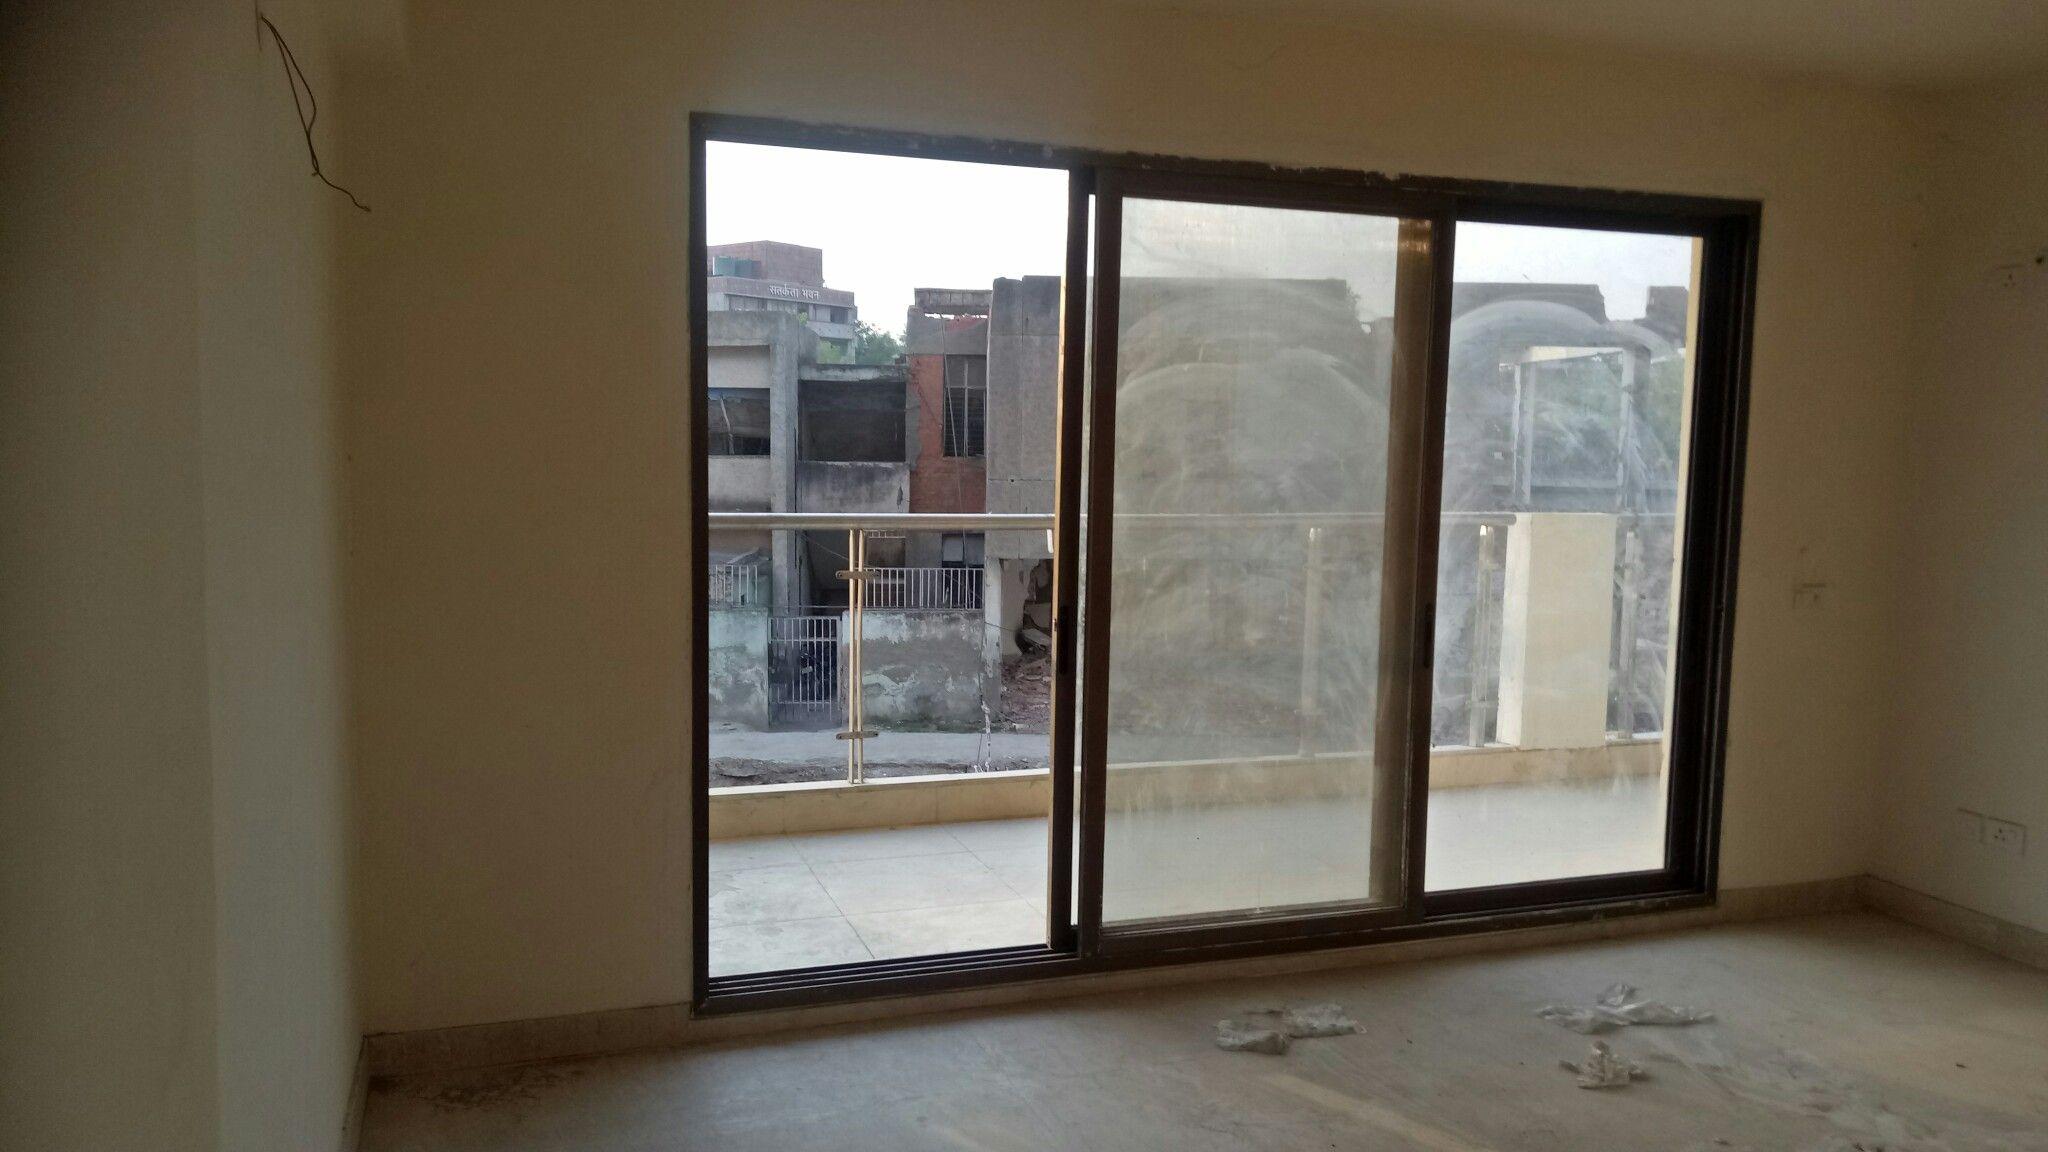 Office renovation contractors in delhi gurgaon noida faridabad